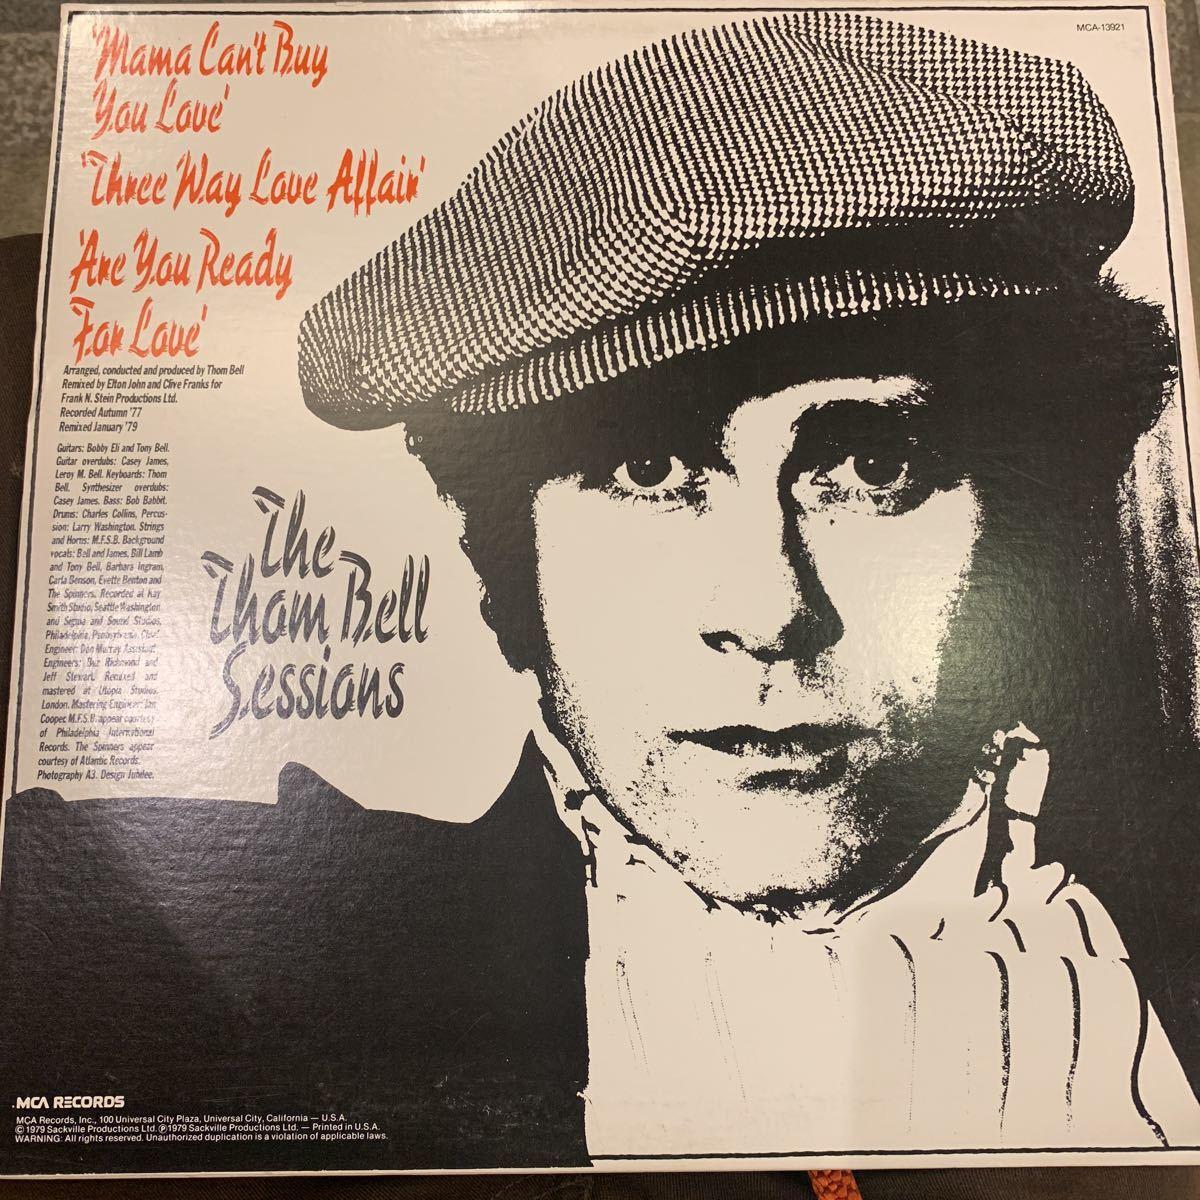 Elton John 「Mama Can't Buy You Love」プロモ盤 中古レコード_画像2